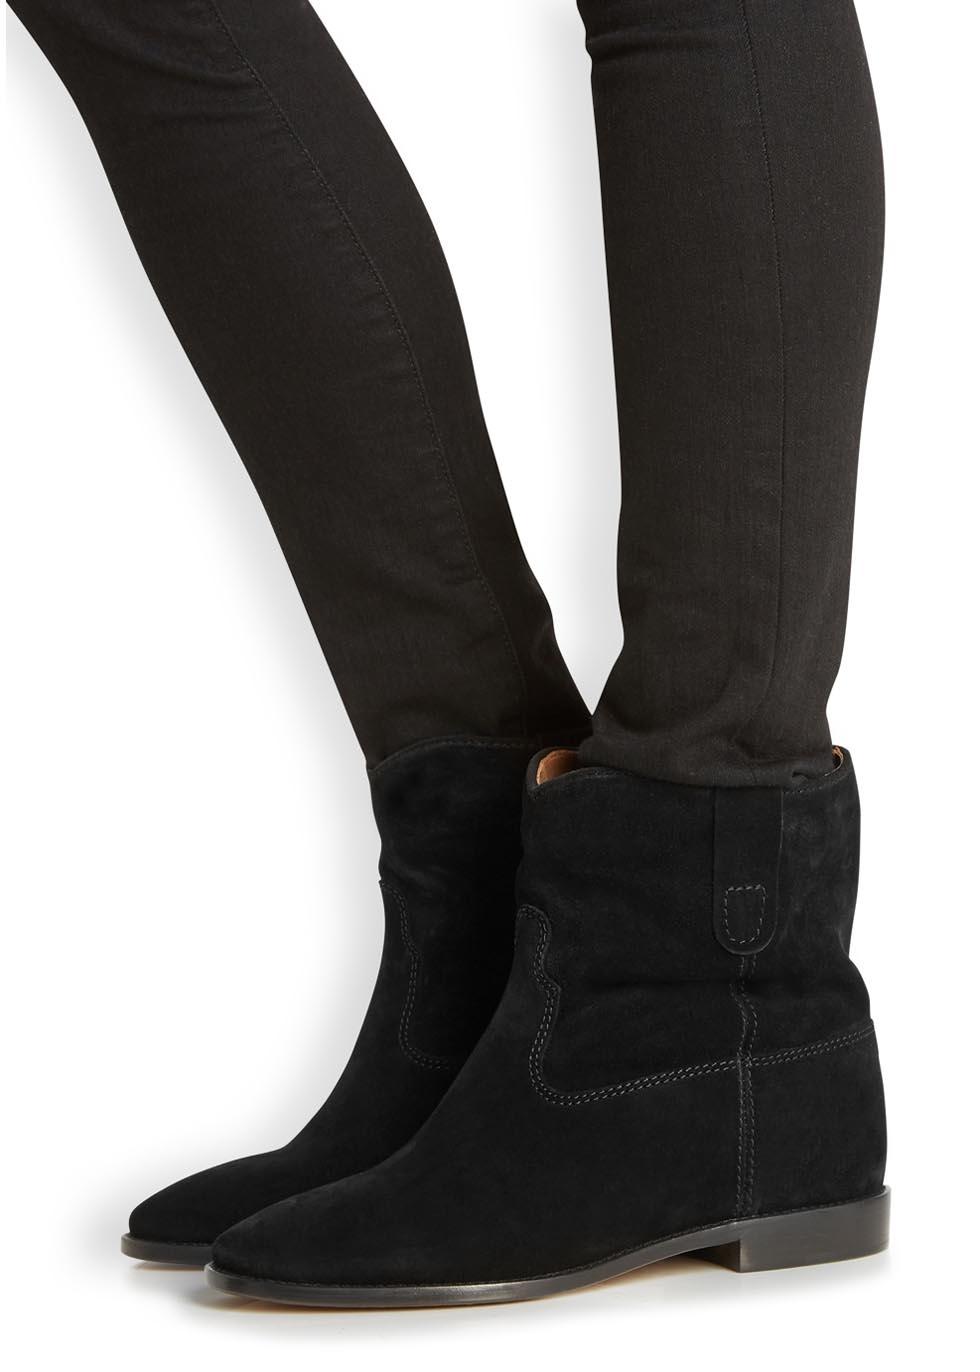 toile isabel marant crisi black suede wedge boots in black lyst. Black Bedroom Furniture Sets. Home Design Ideas